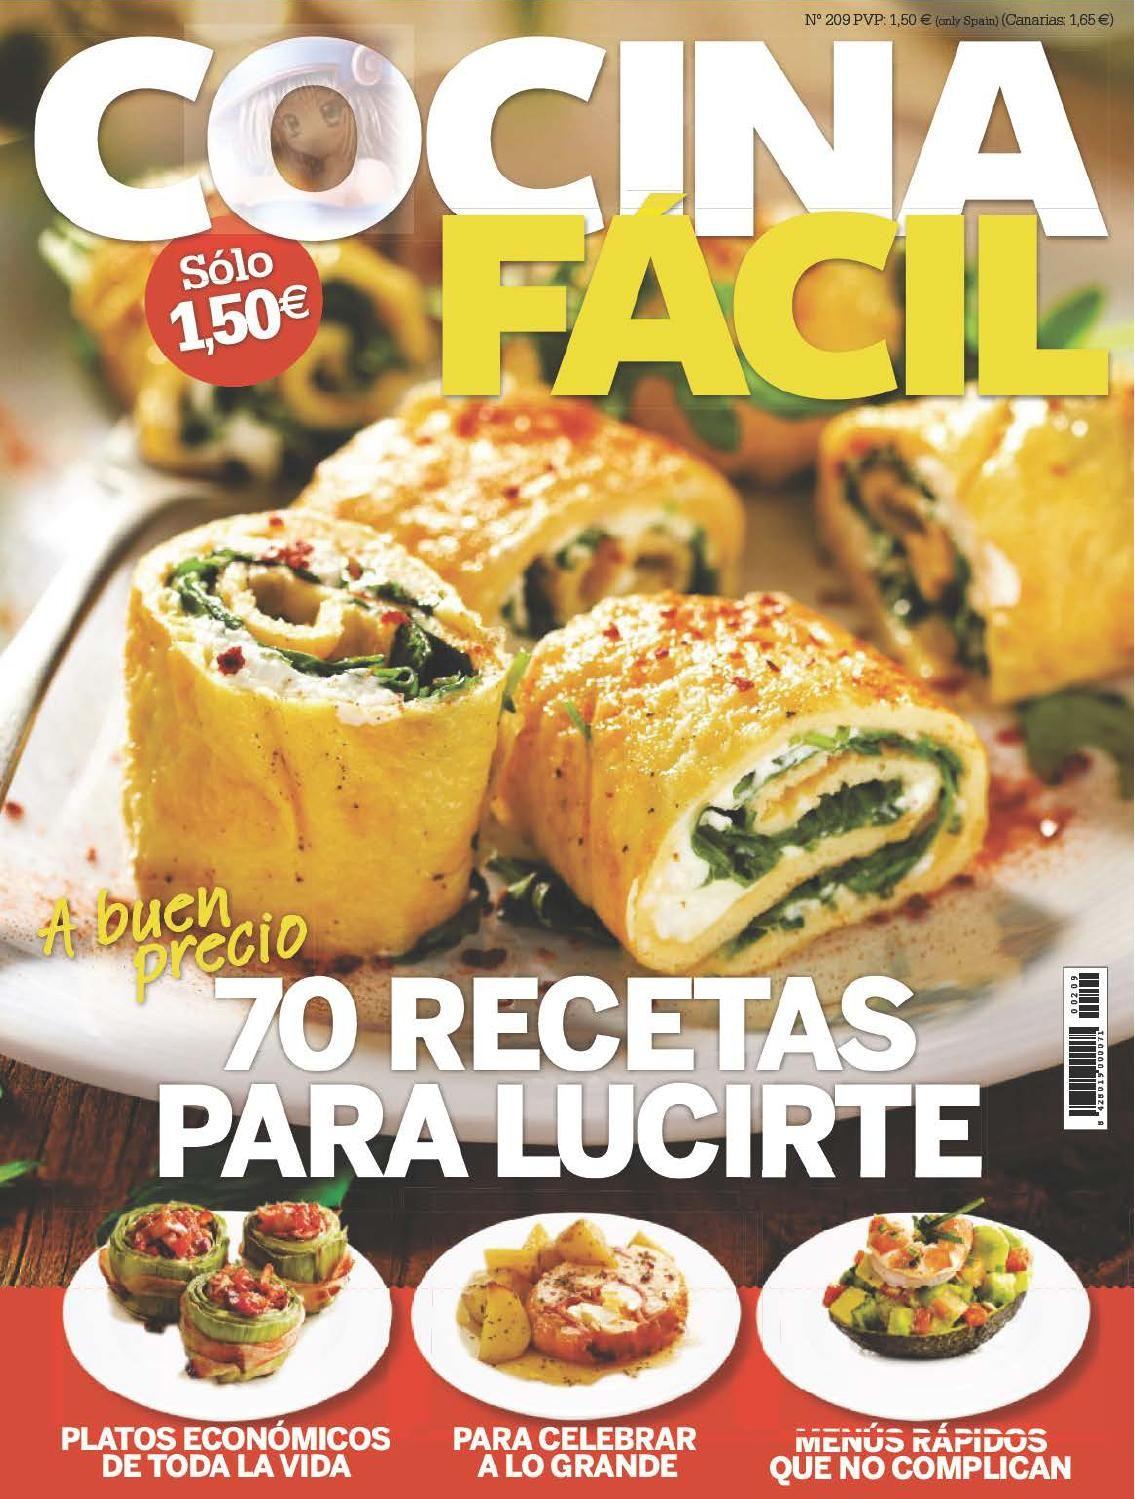 Cocina f cil n 209 mayo 2015 revistas de cocina cooking - Ana cocina facil ...